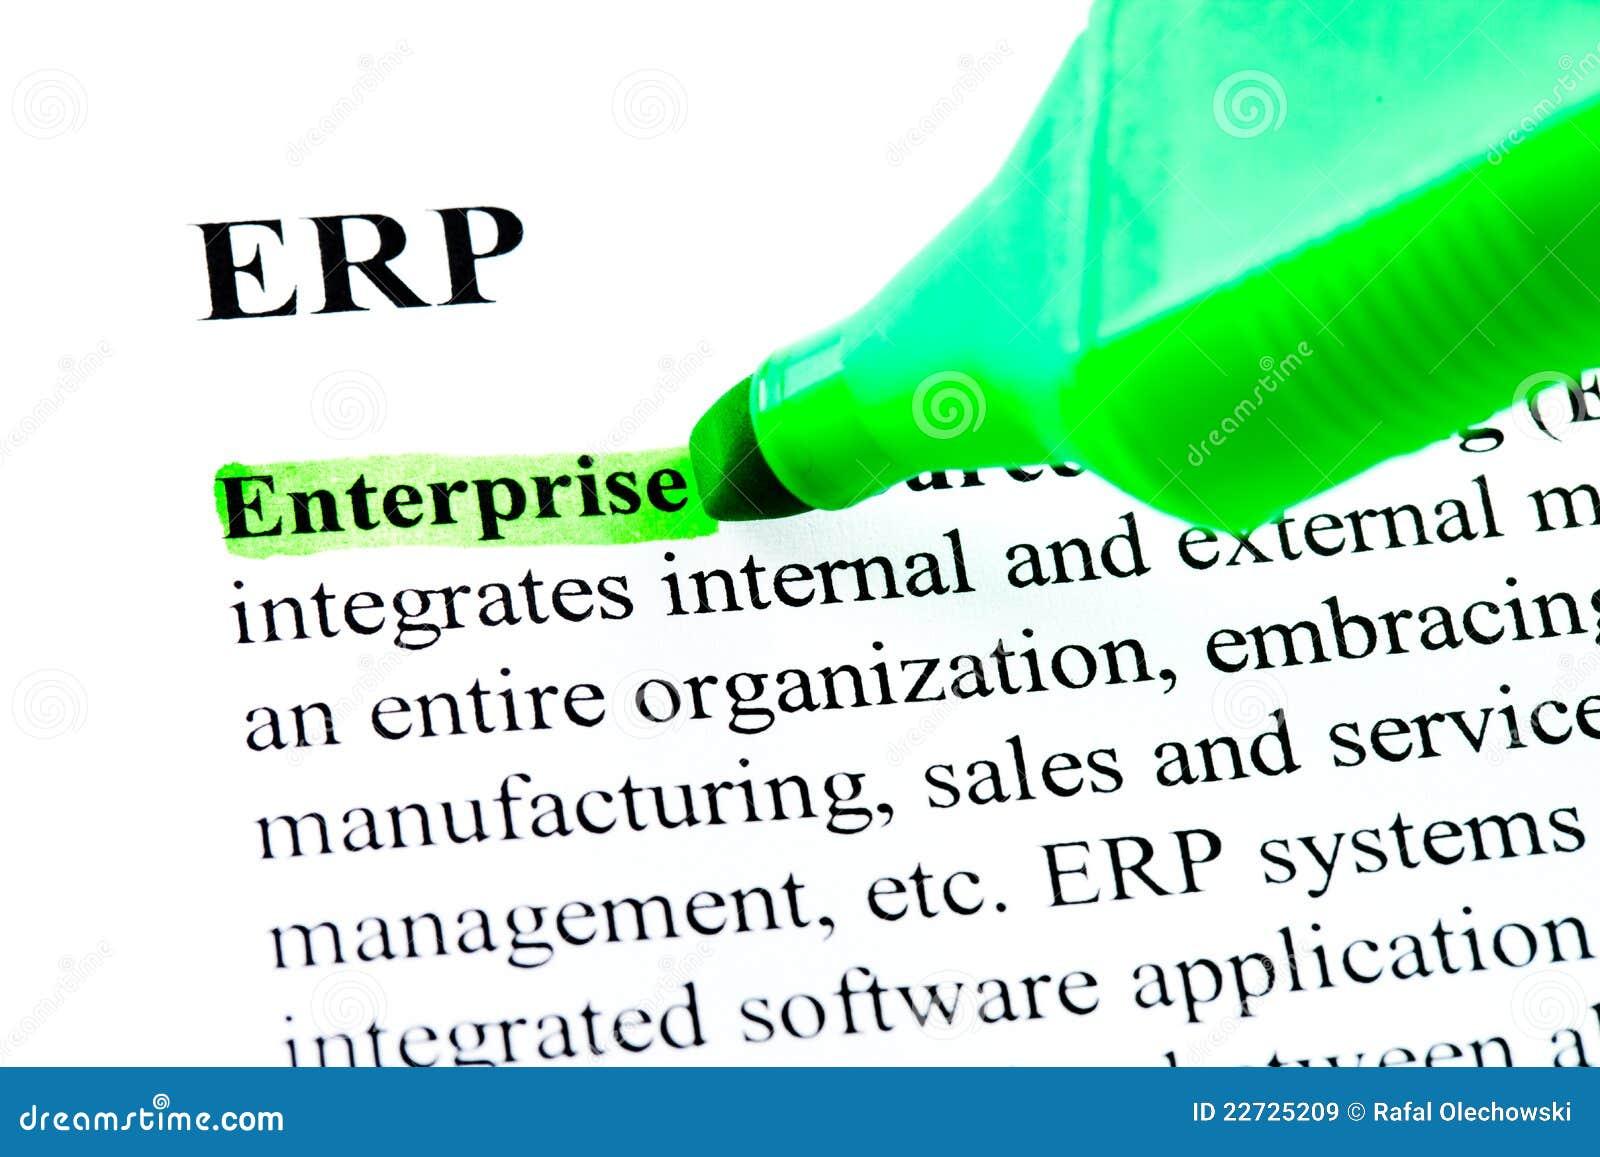 erp description